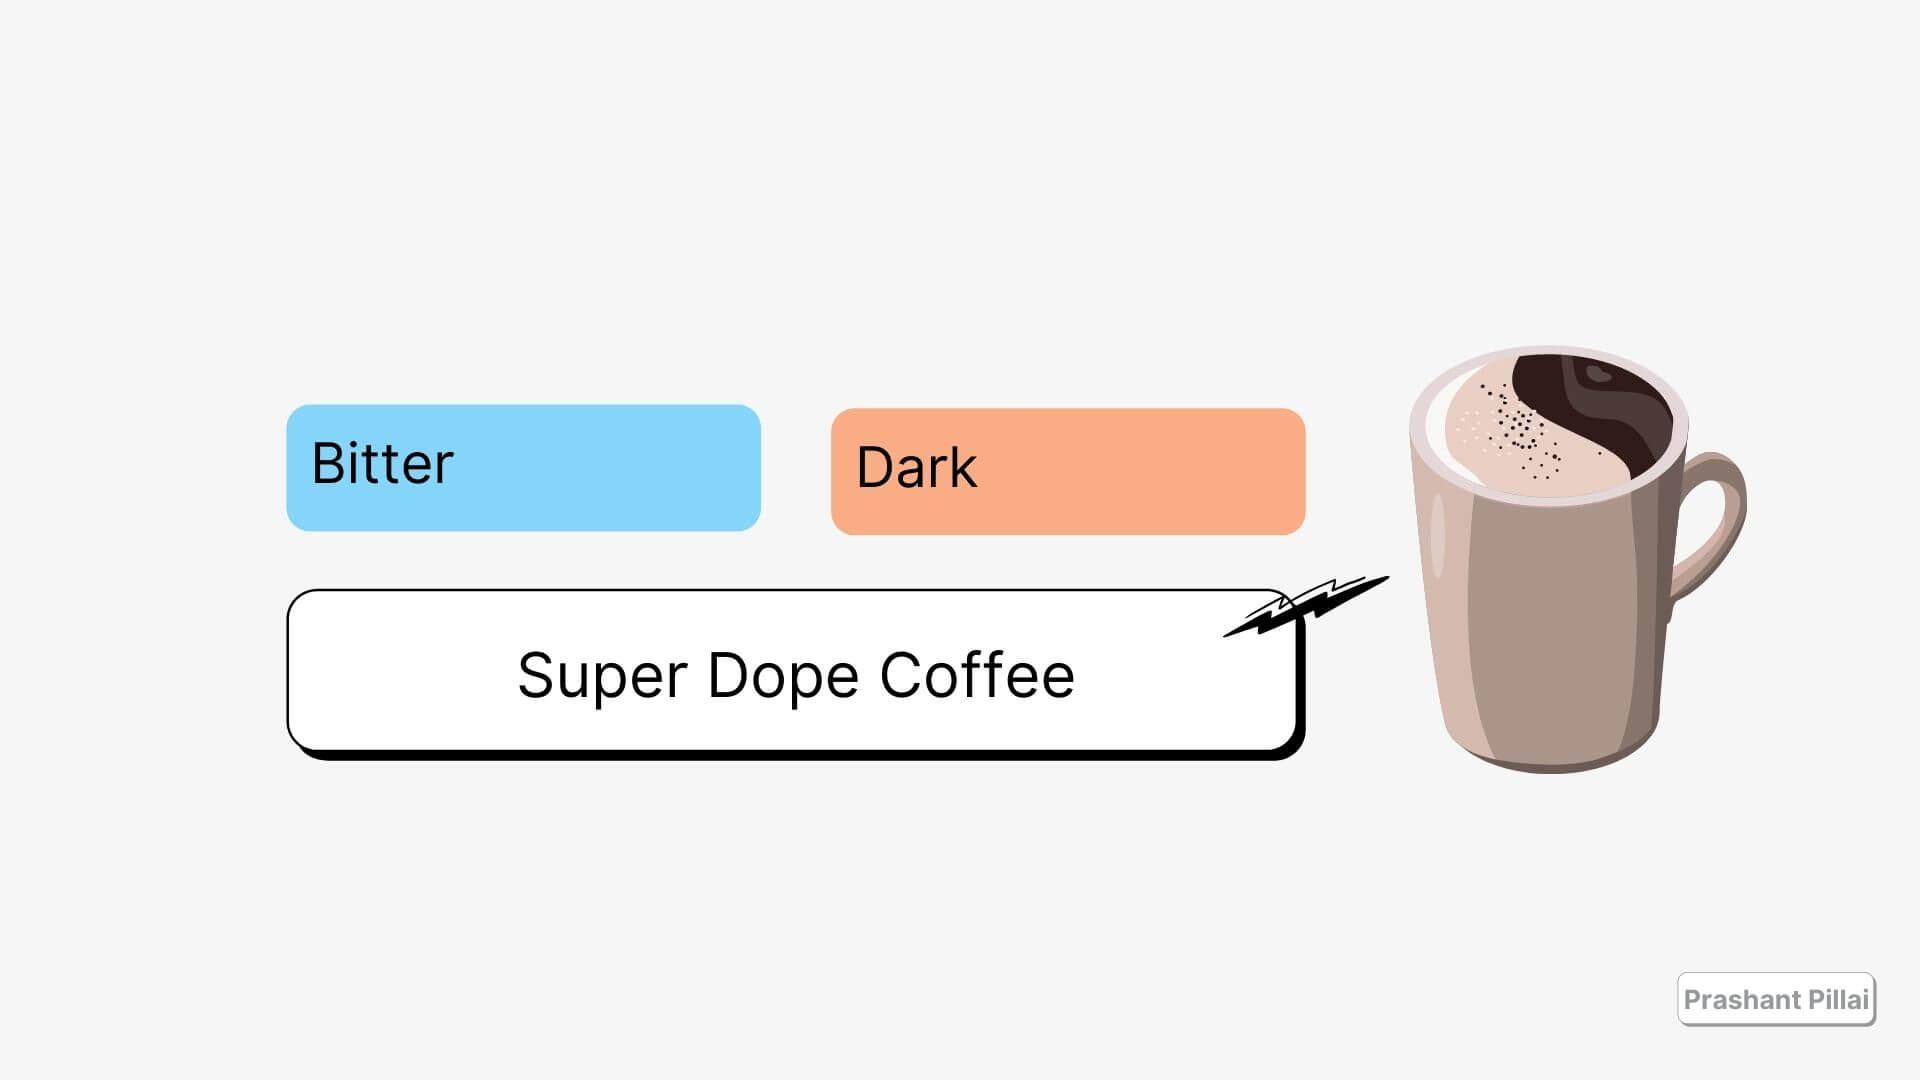 Black coffee is good